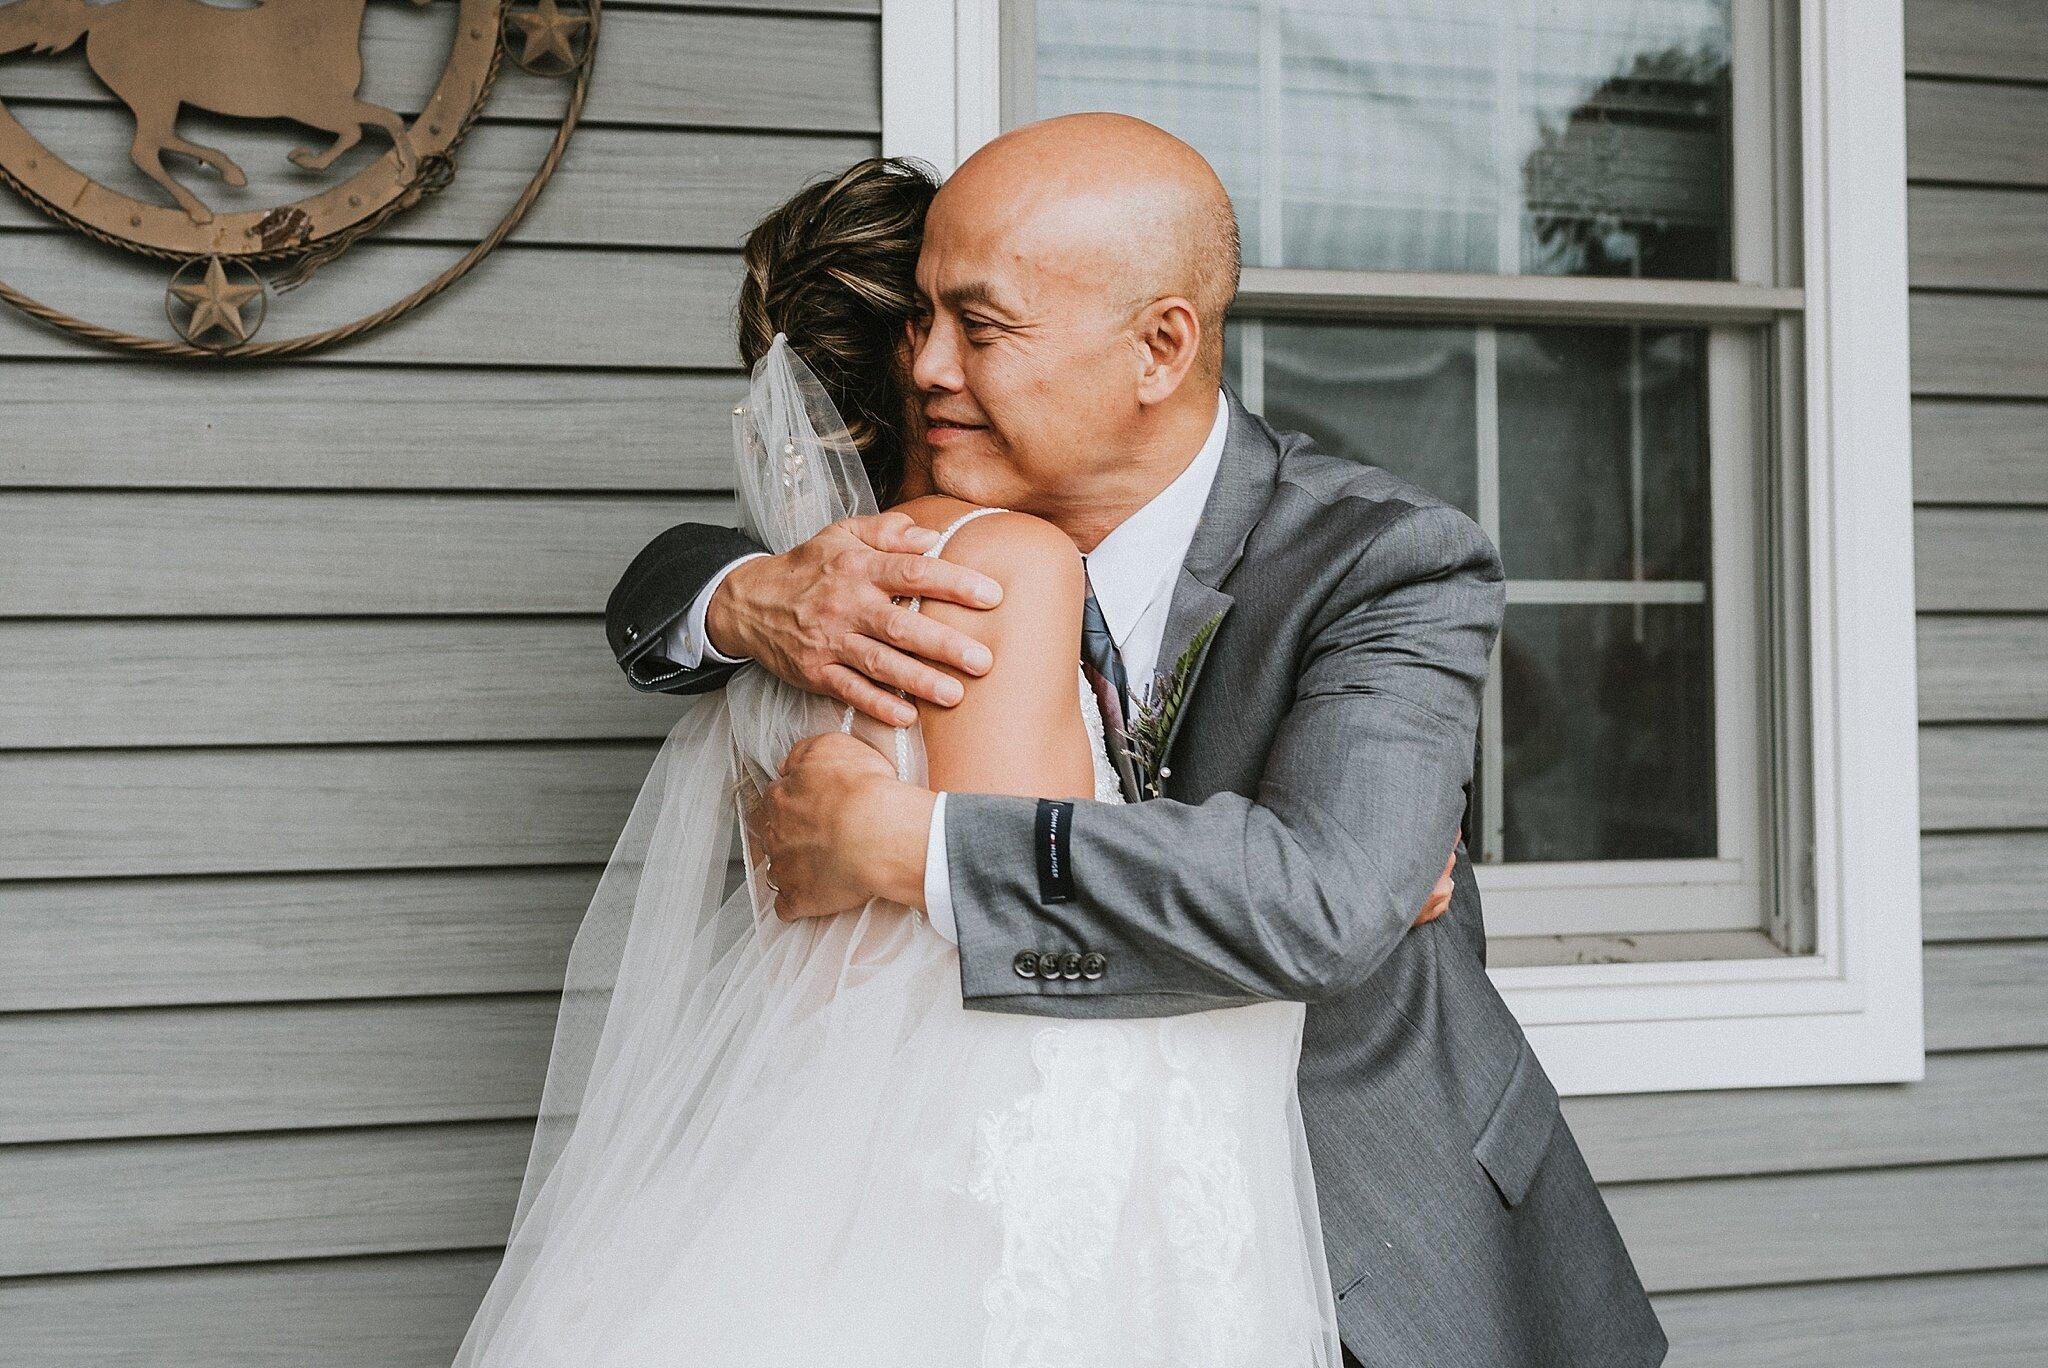 connecticut_wedding_3014.jpg